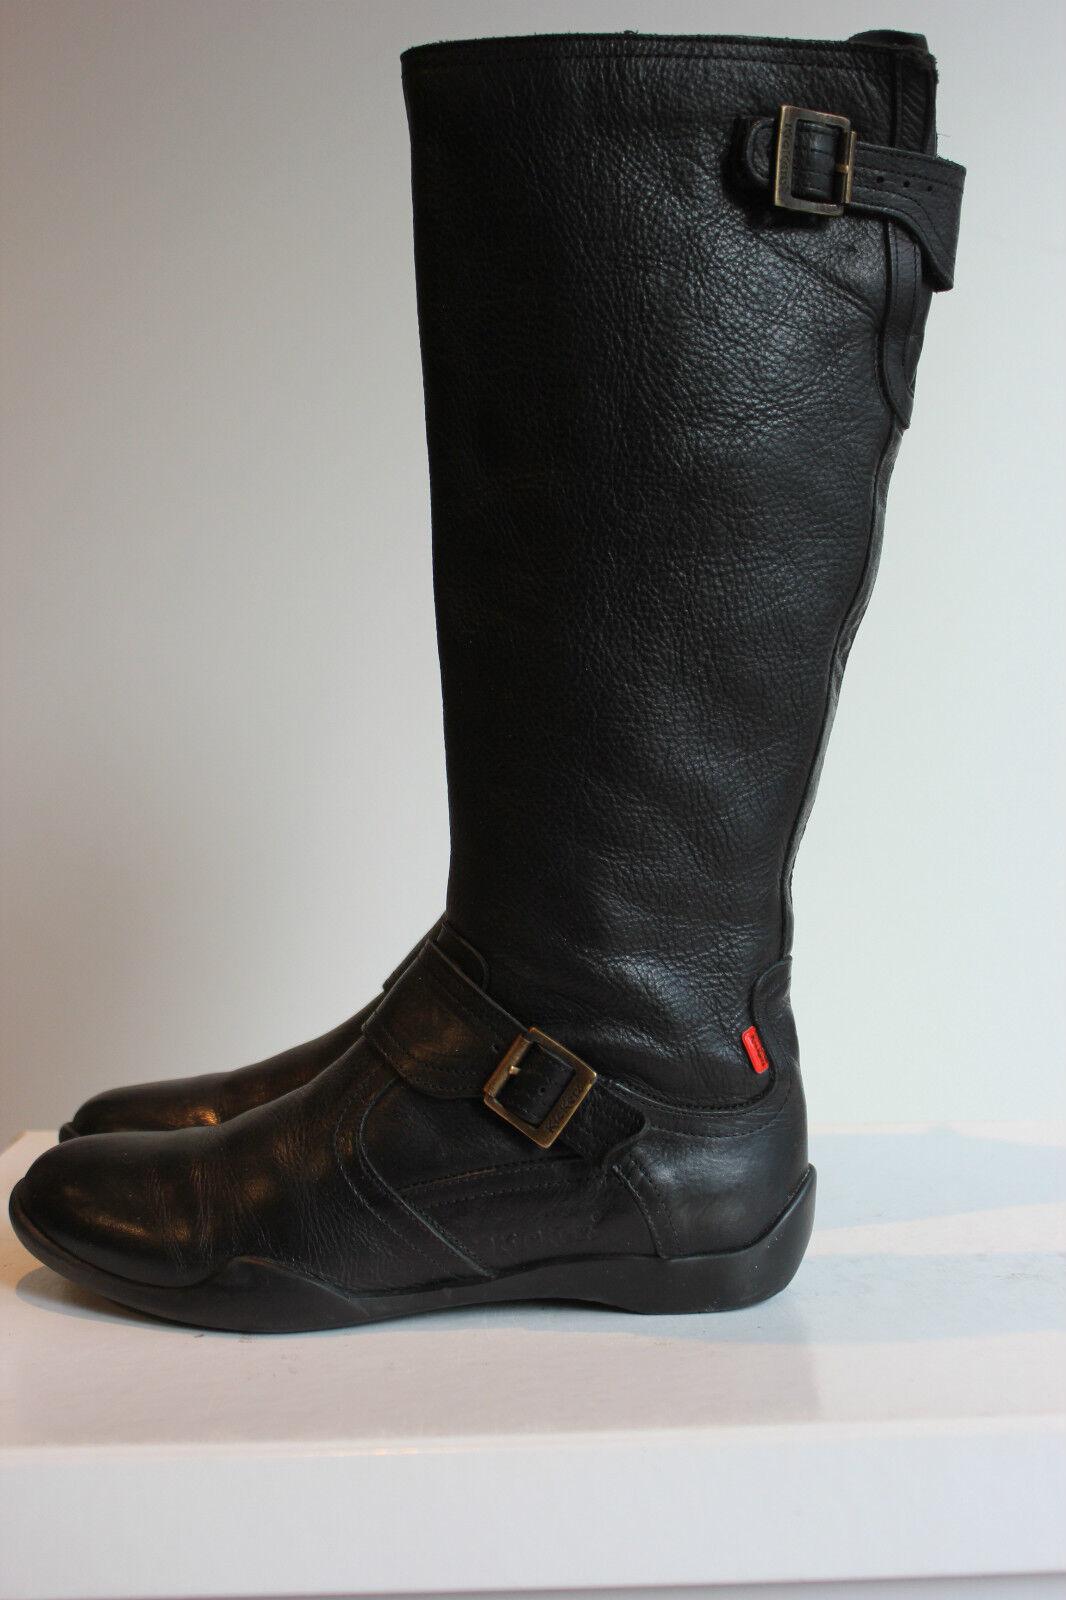 Kickers bellissima Nero Echt Leder stivali, Tg. 39, ottimo stato